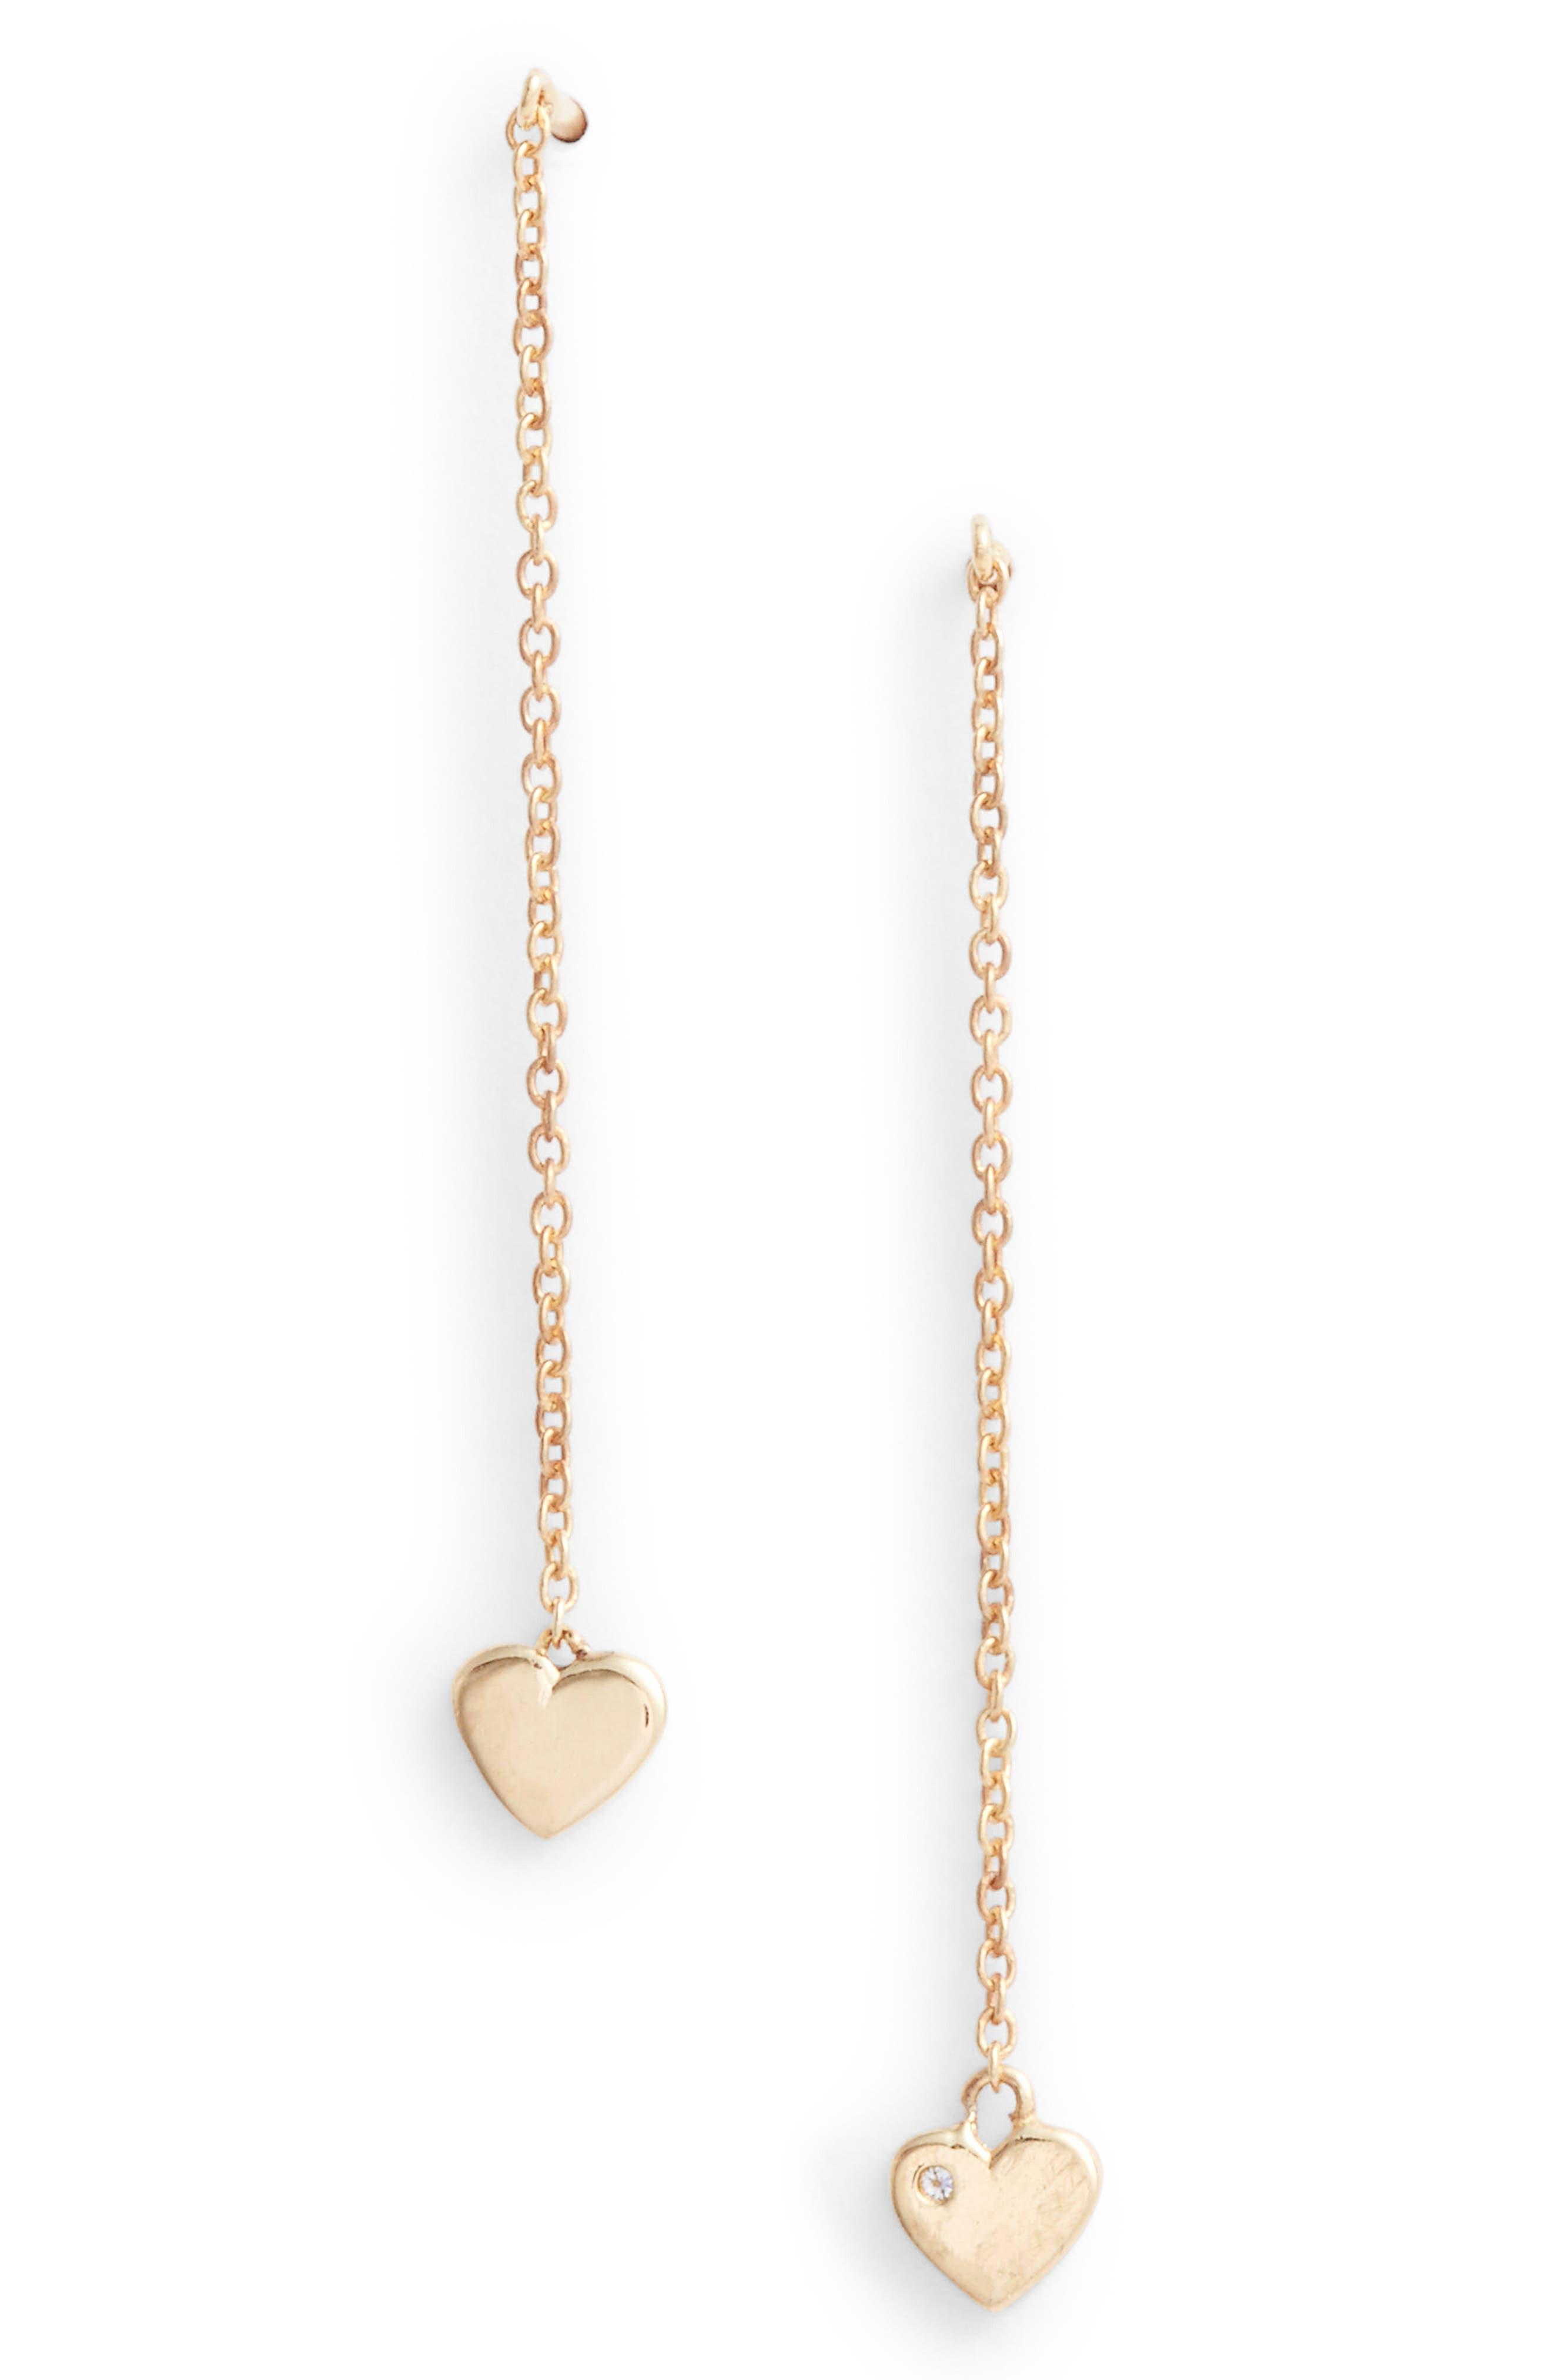 Shy by SE Heart Threader Earrings,                         Main,                         color,